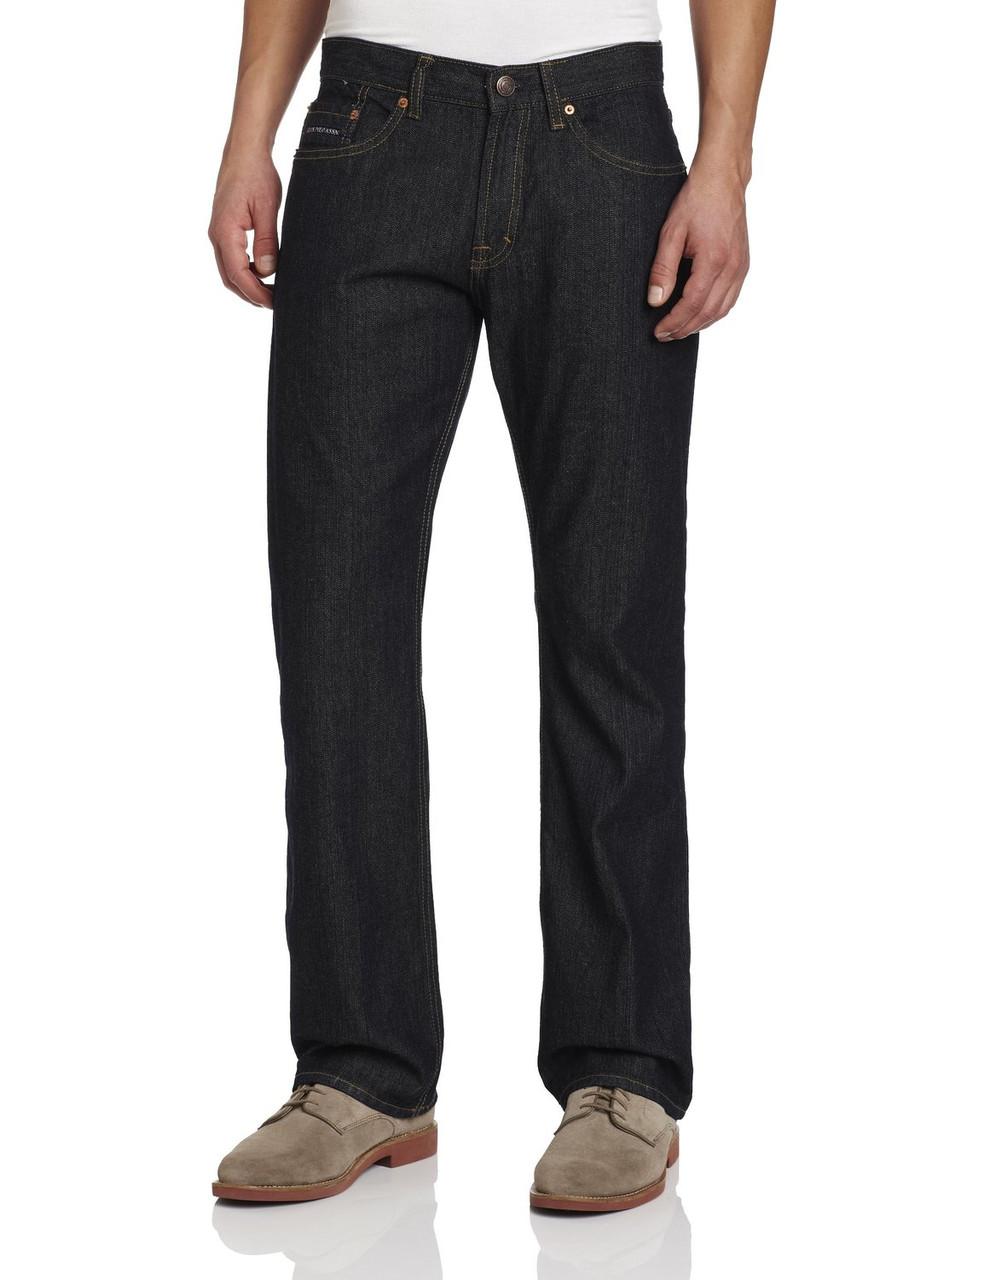 Джинси U. S. Polo Assn. Slim Fit Bootcut Leg, Blue, 38W30L, 112898YX